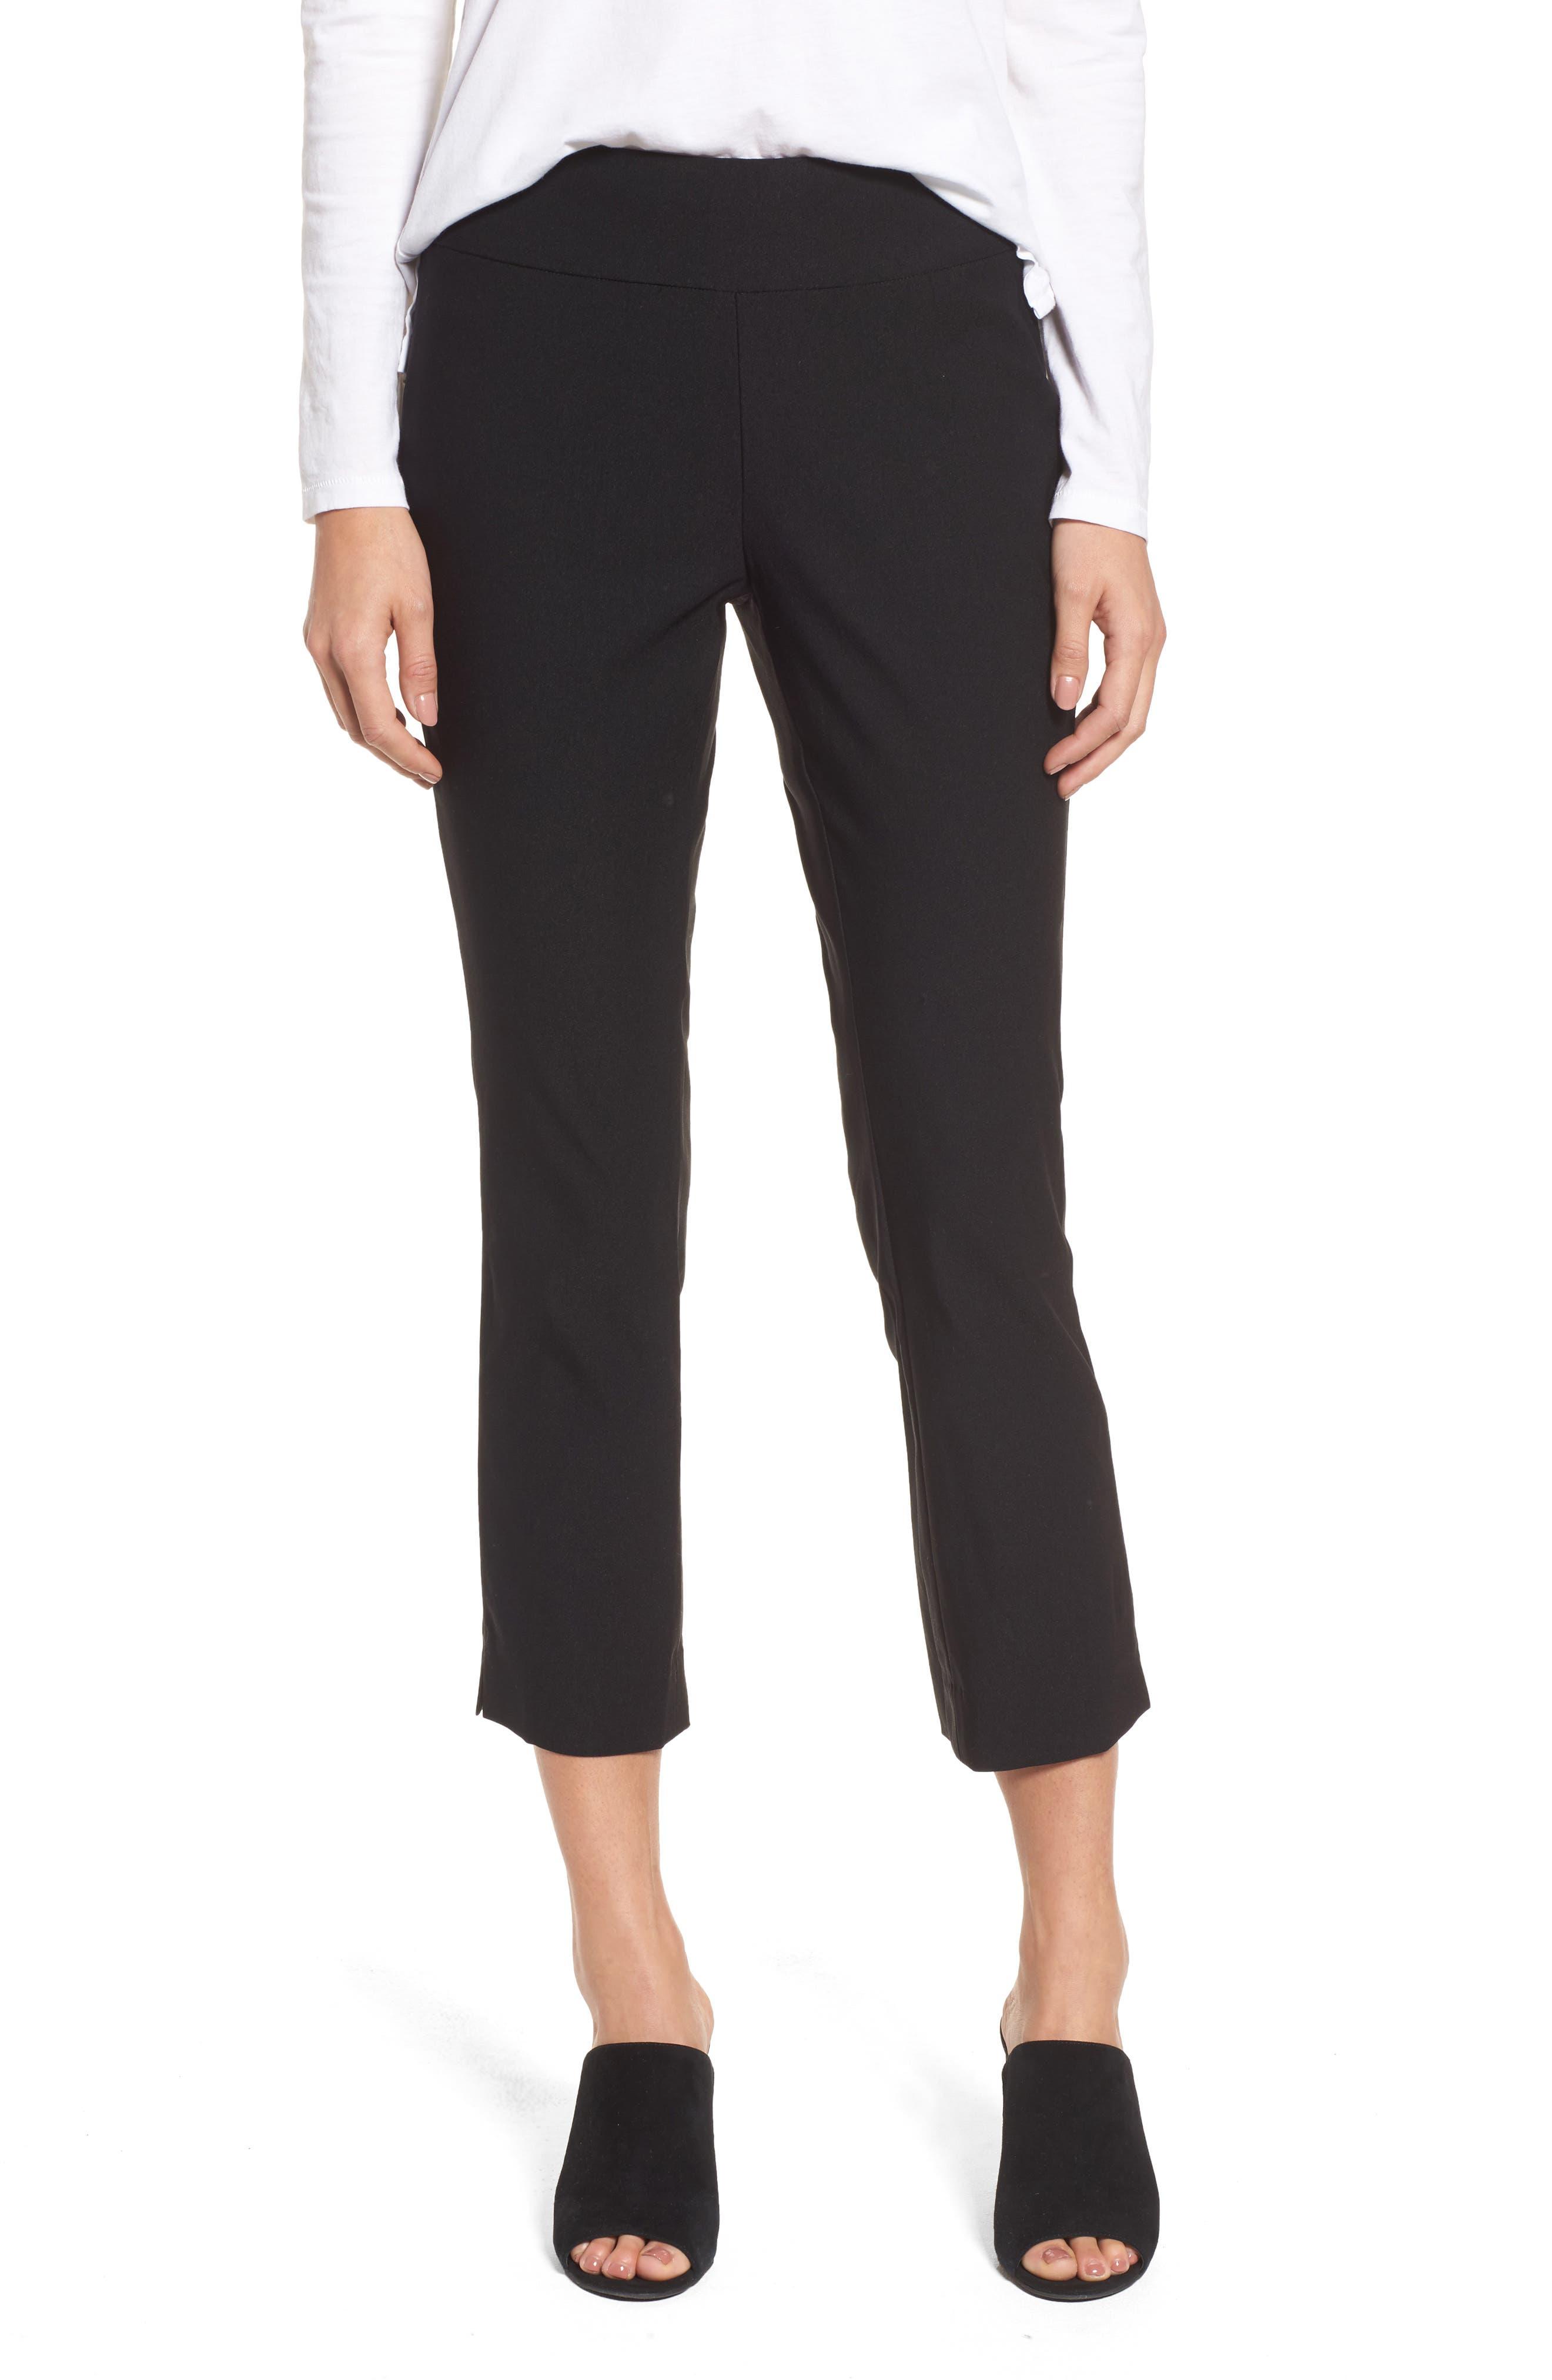 Wonder Stretch Crop Pants,                         Main,                         color, BLACK ONYX